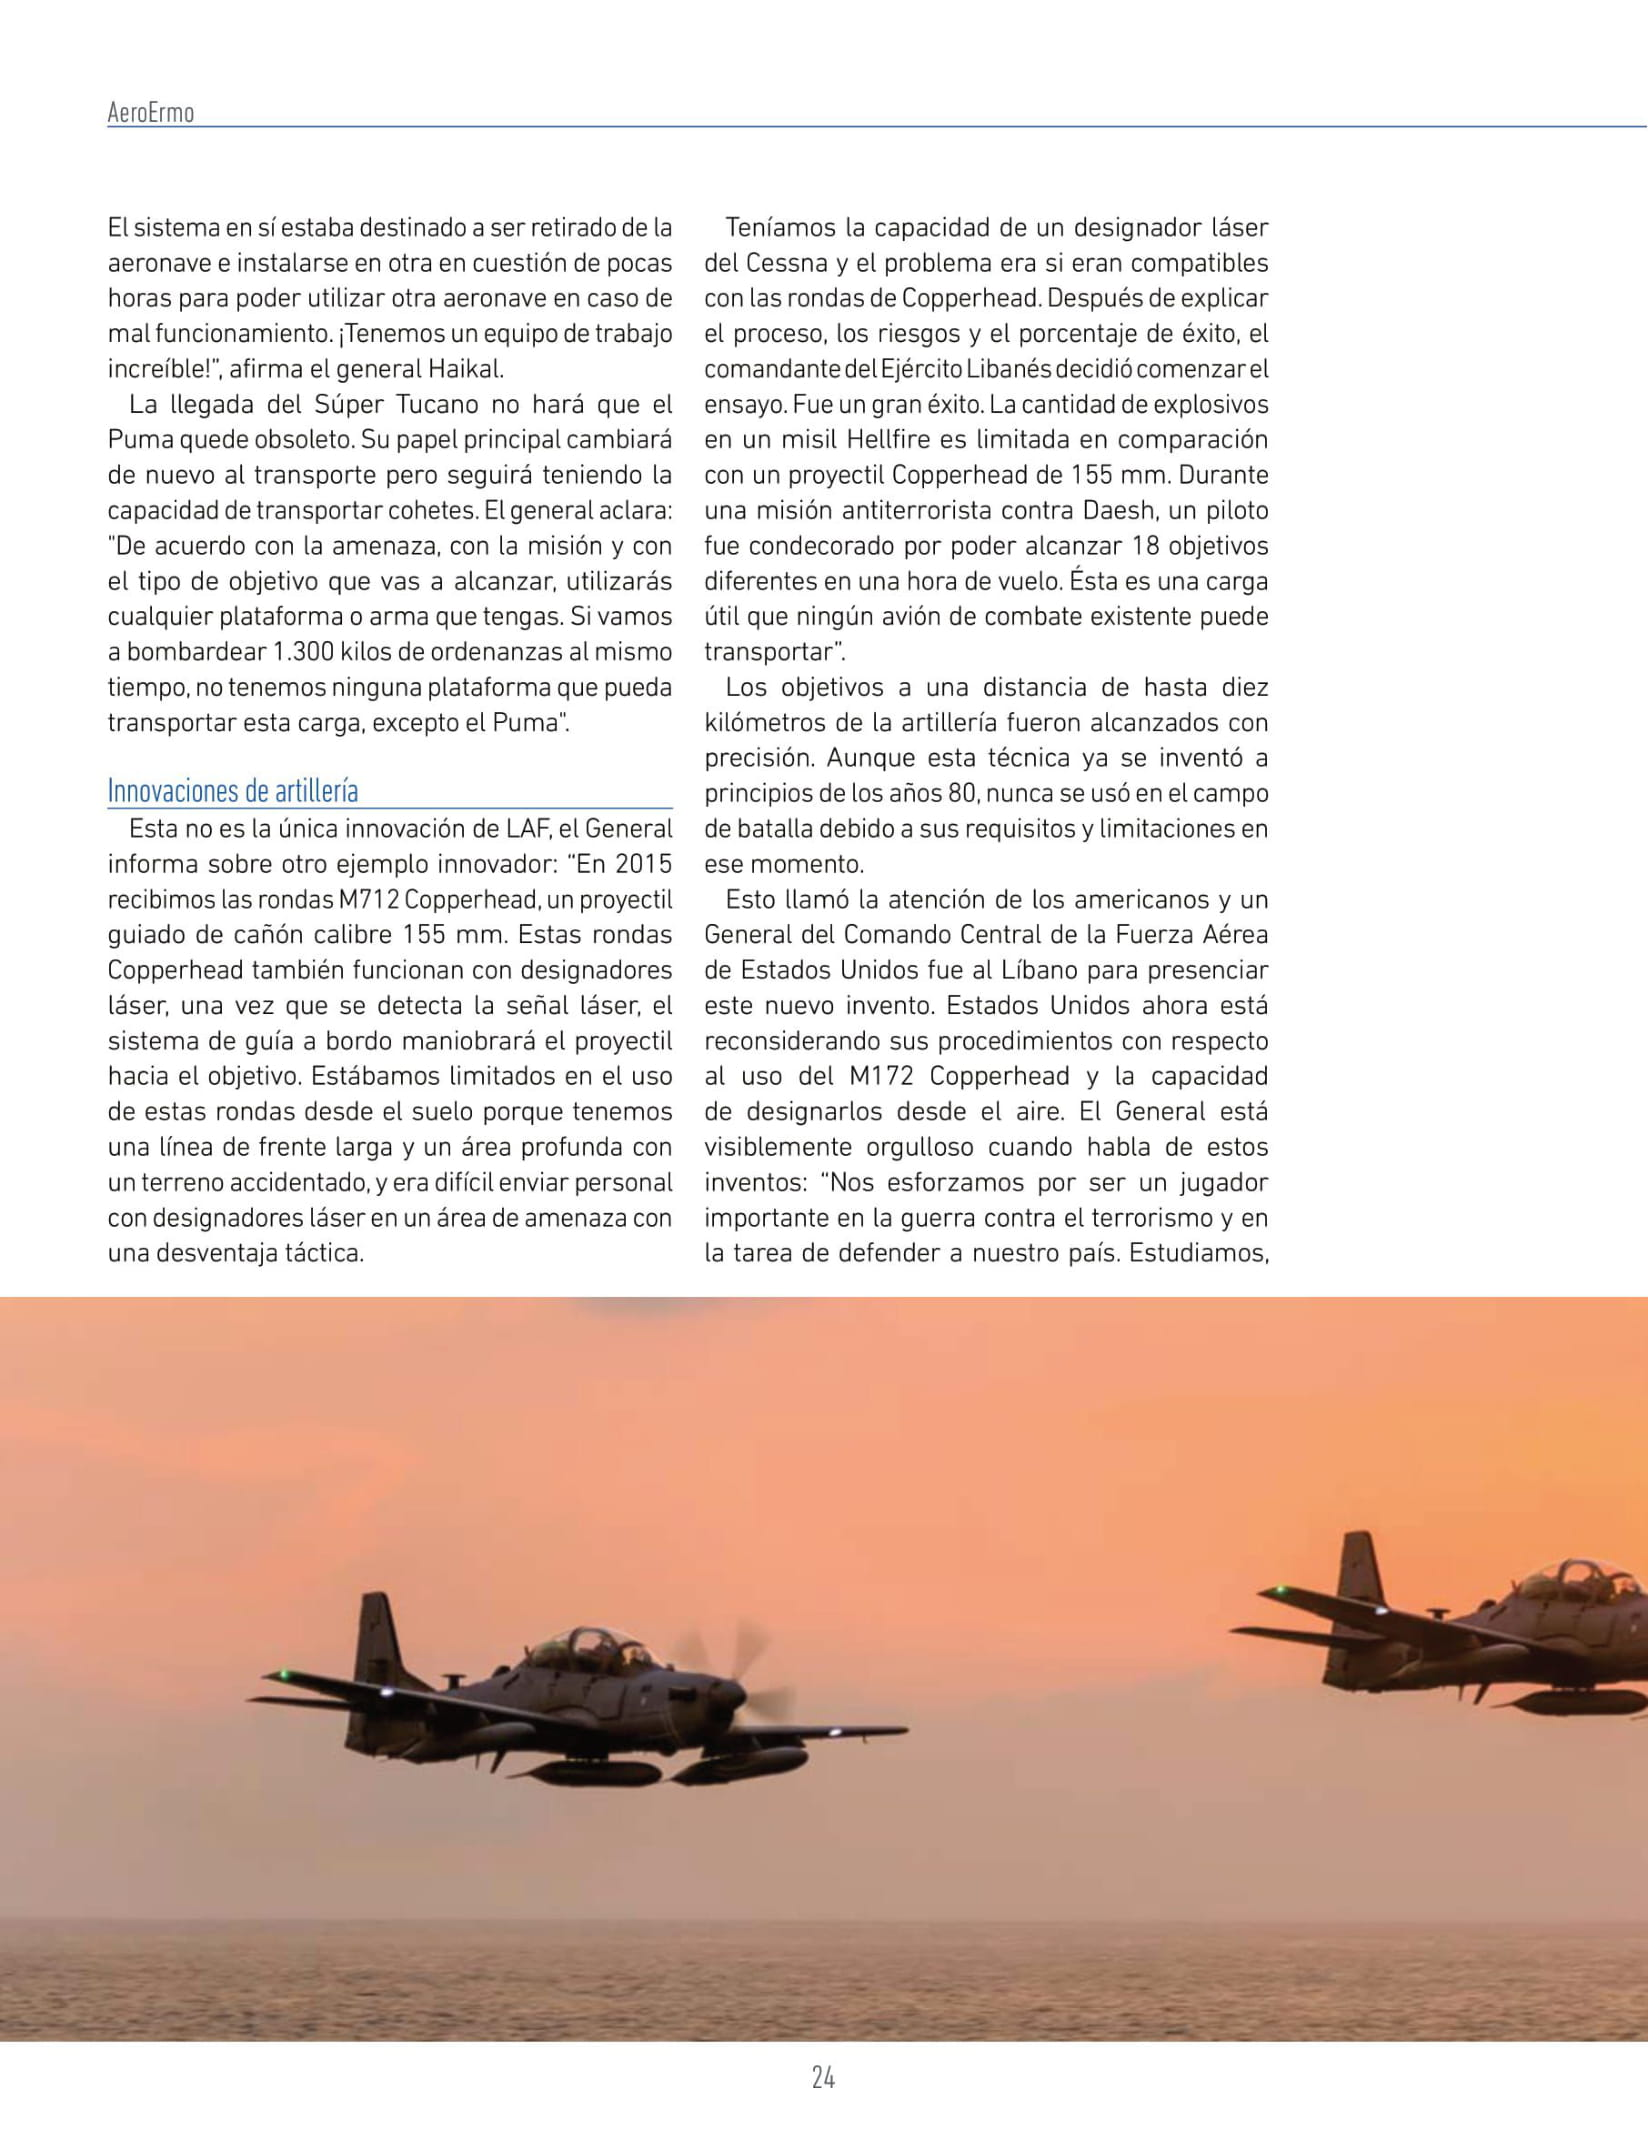 AeroErmo Revista(Colombia)_Lebanese Air Force-6